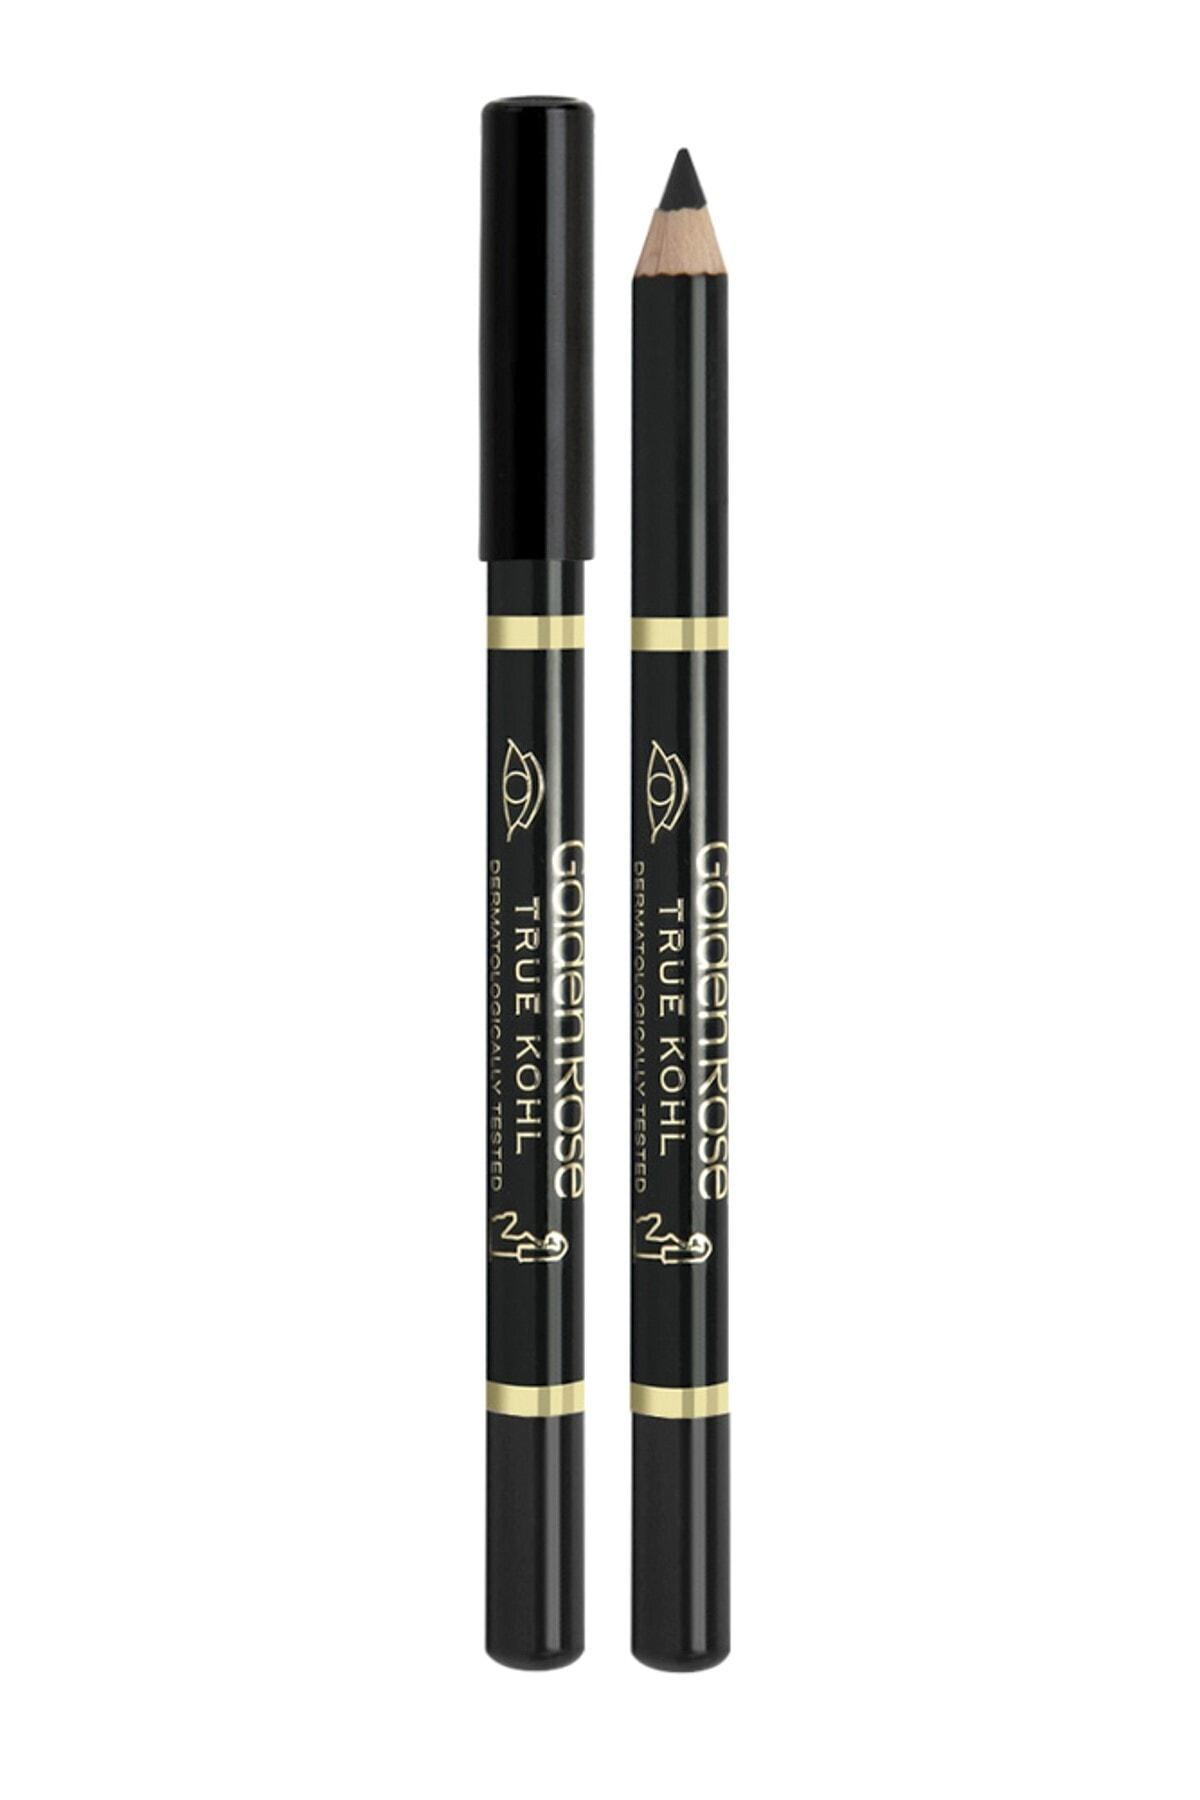 Golden Rose Siyah Eyeliner - True Kohl Eyeliner Black 8691190090098 1